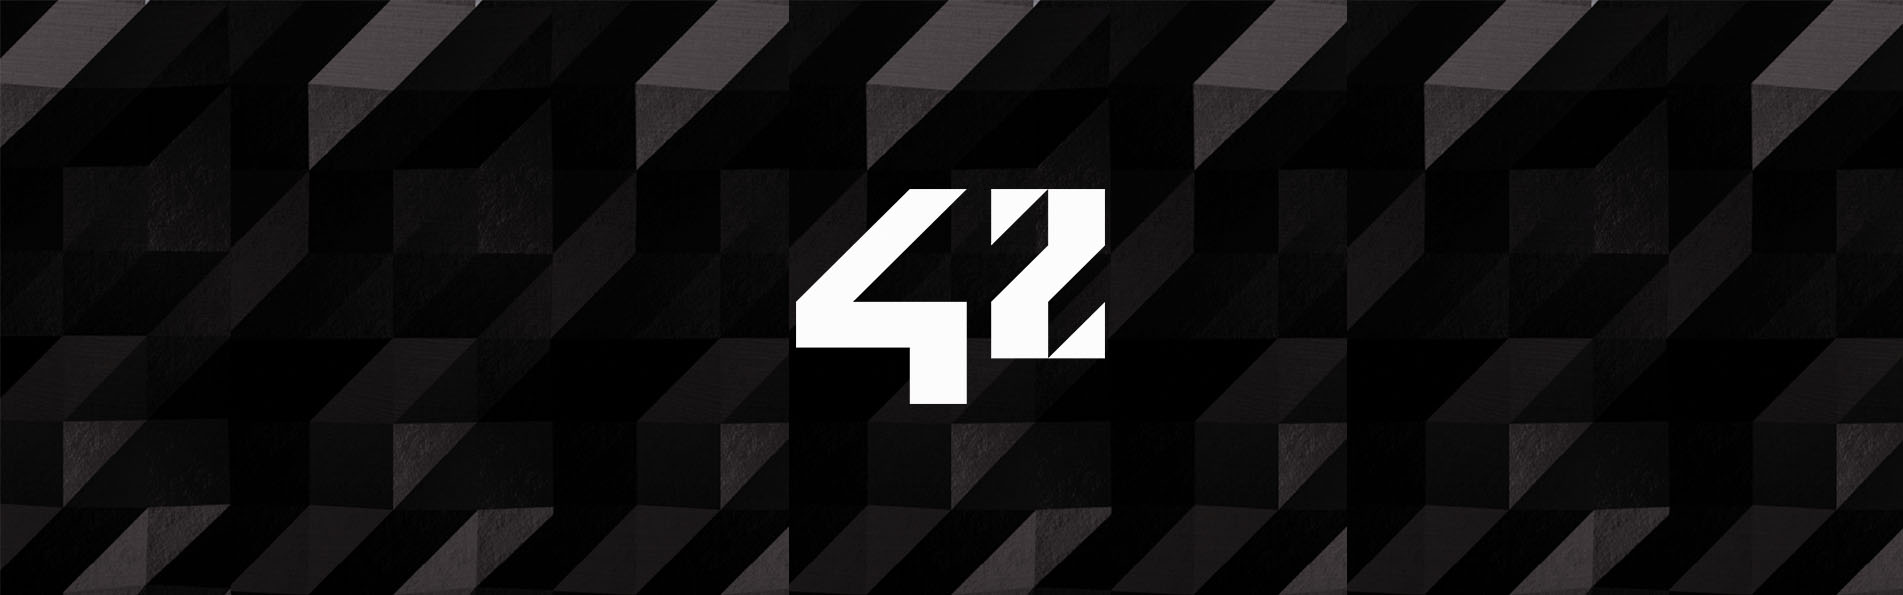 42-born-to-code-3